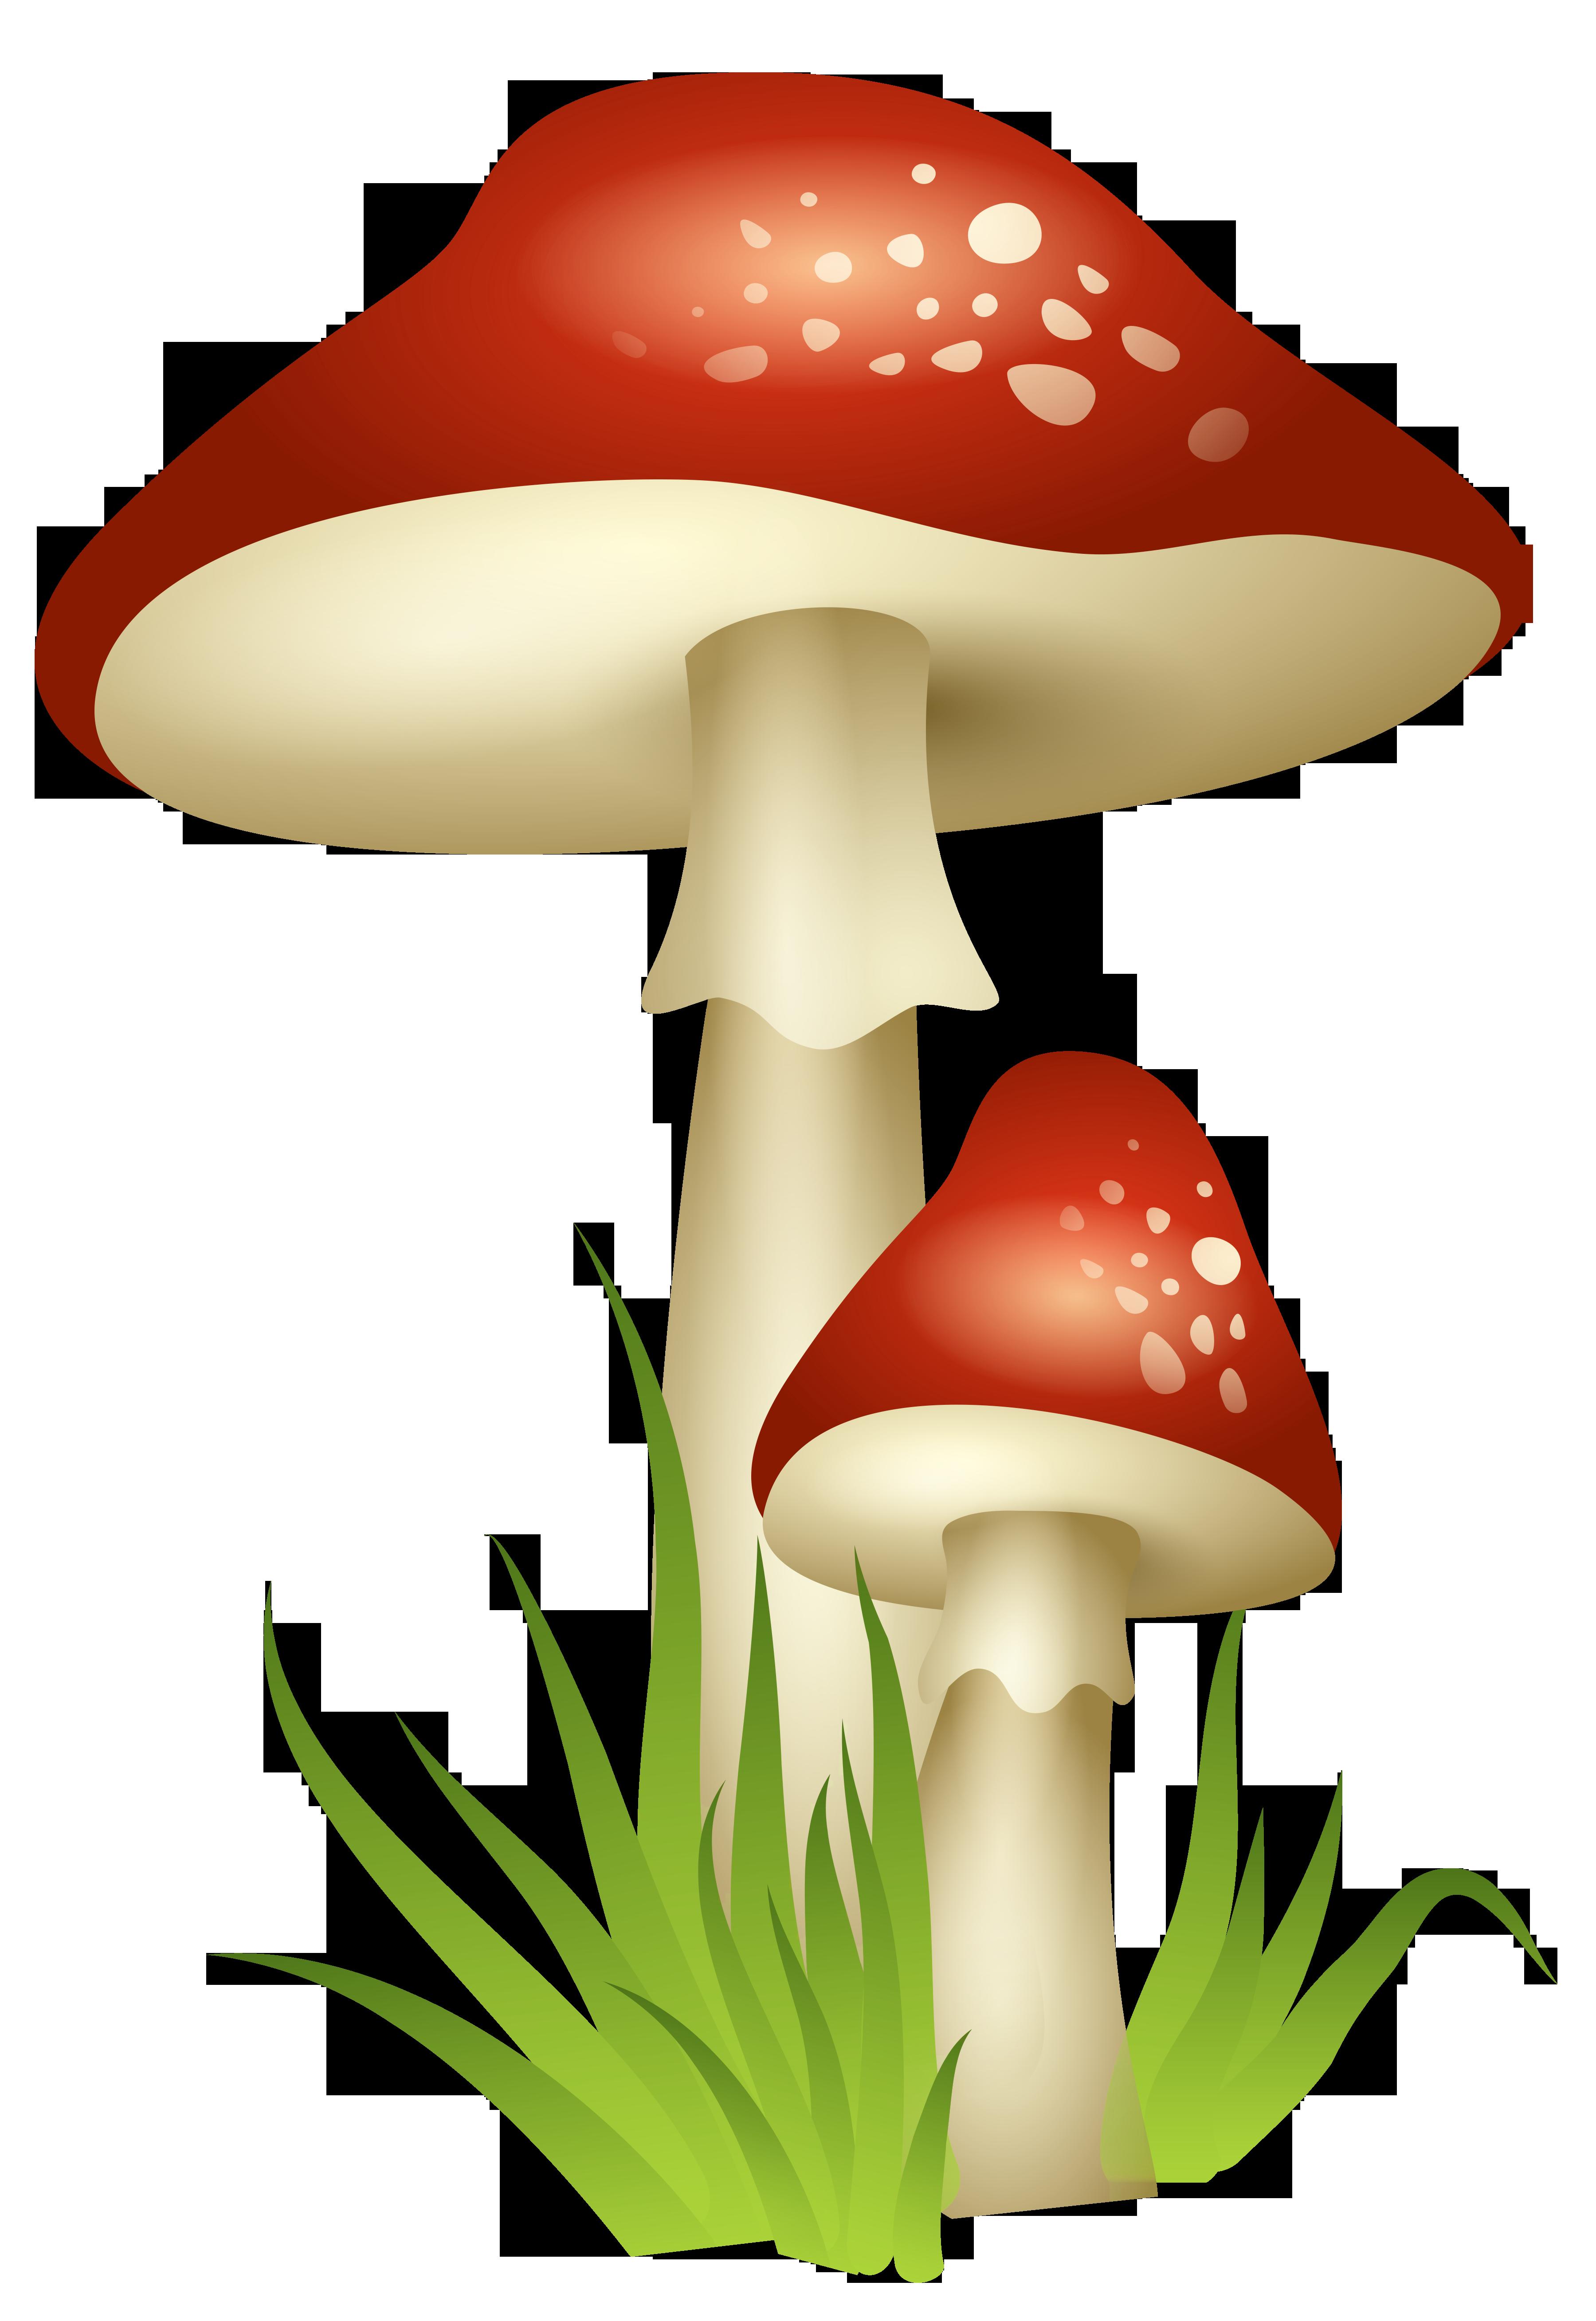 Free mushroom clipart free download Free Magic Mushrooms Cliparts, Download Free Clip Art, Free Clip Art ... free download